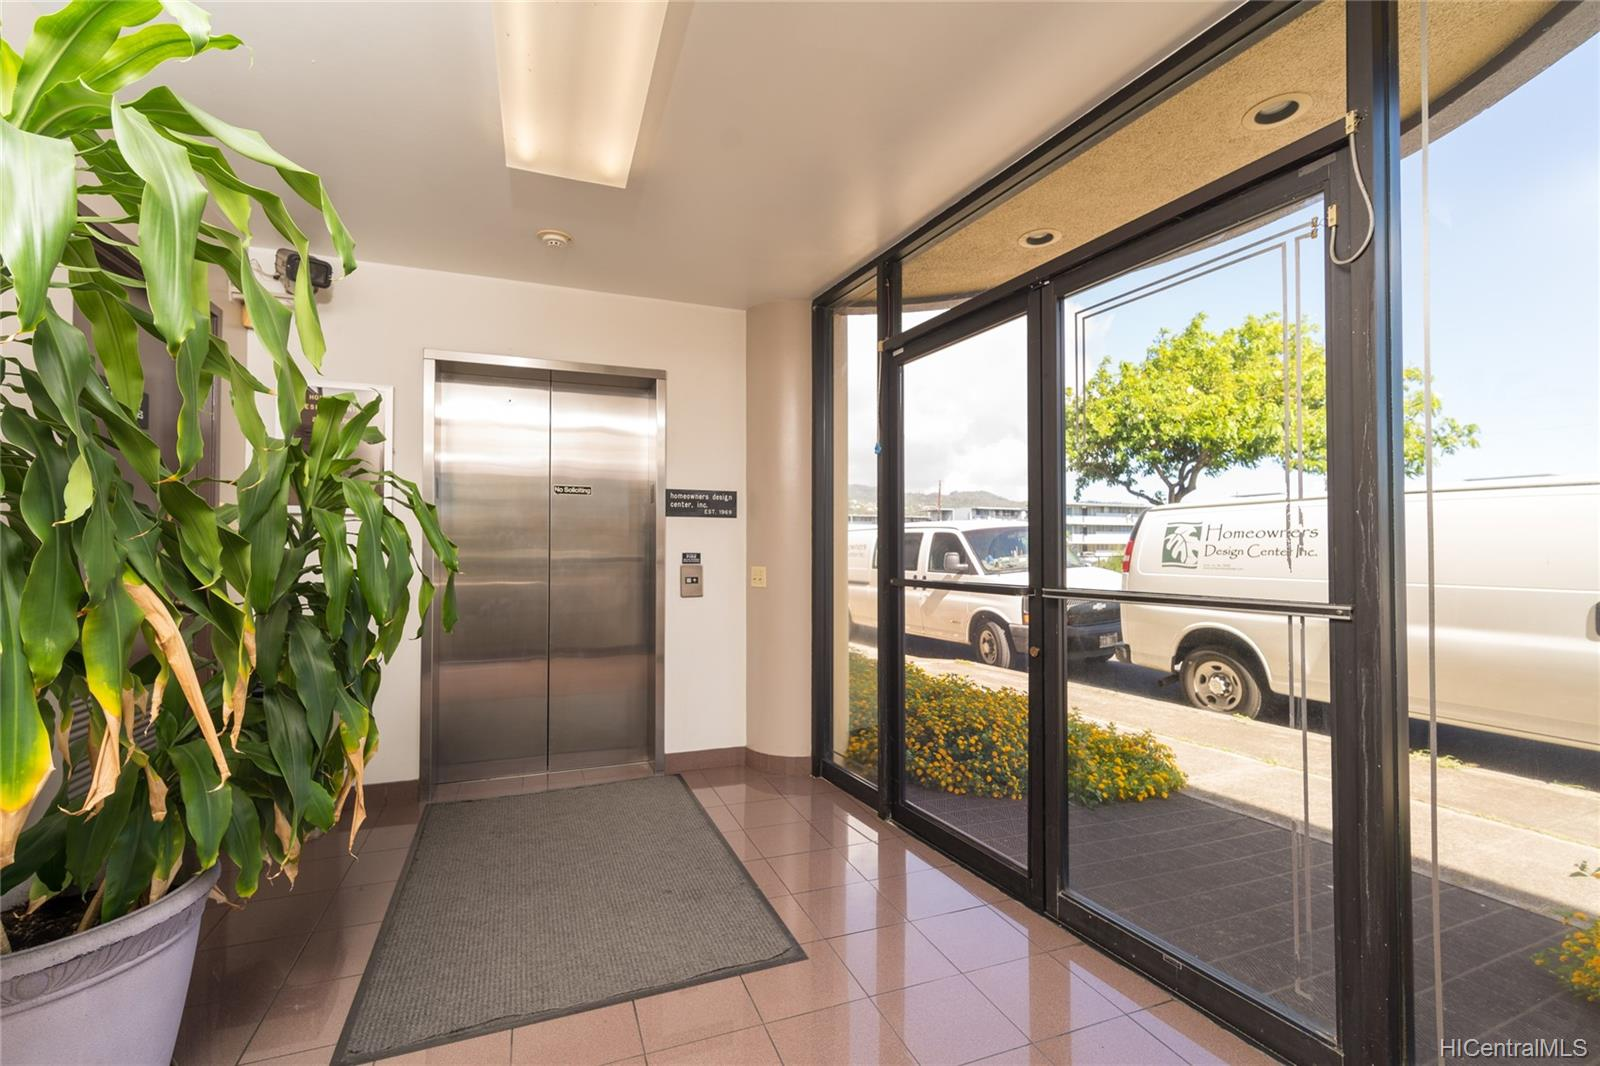 1030 Kohou Street Honolulu Oahu commercial real estate photo13 of 25